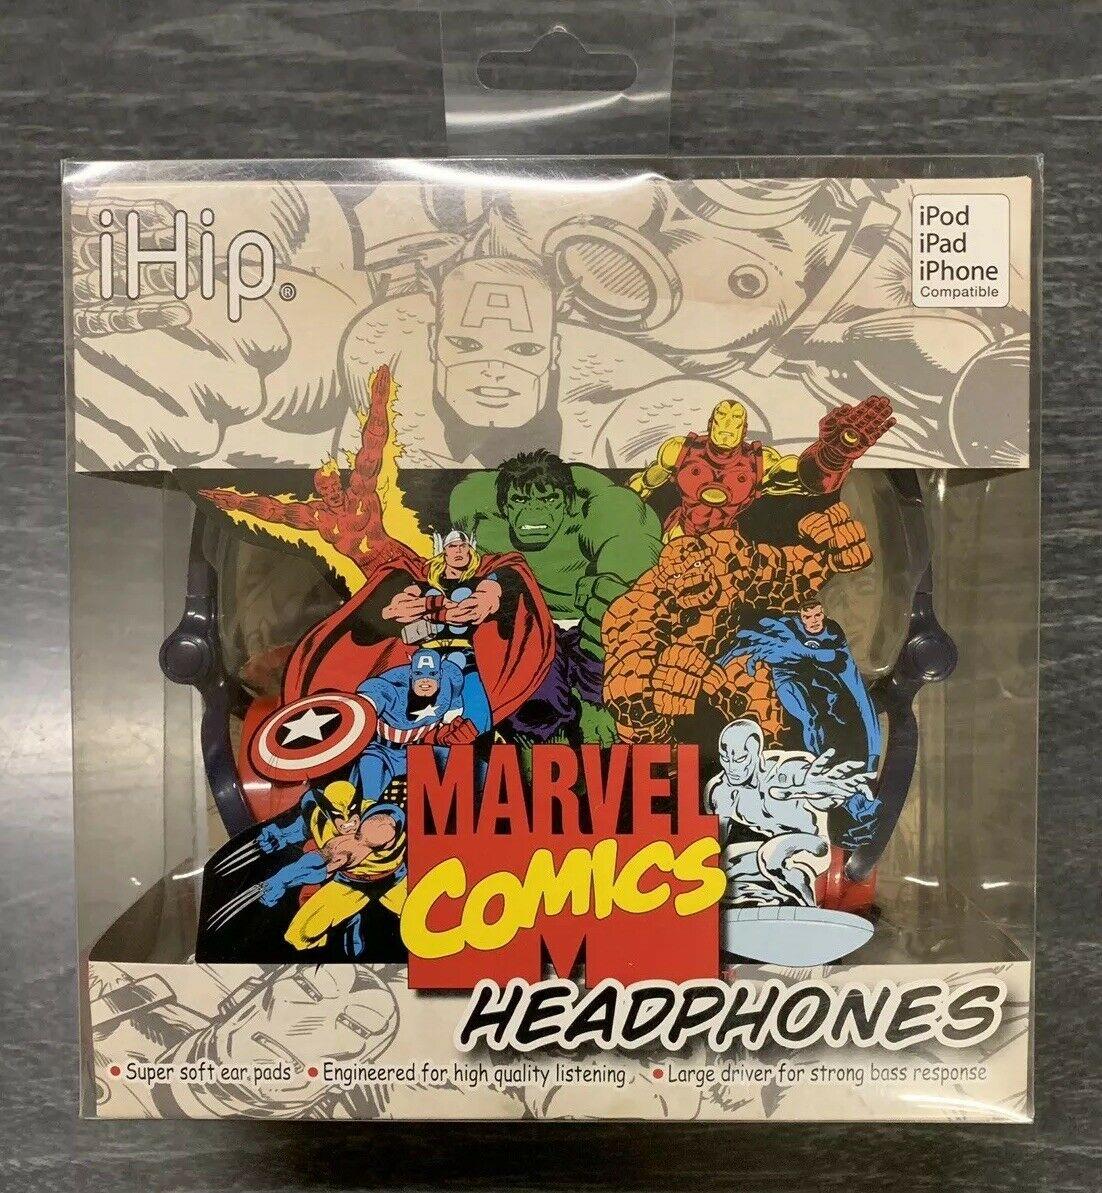 MARVEL COMICS iHip HEADPHONES EARPHONE iPod iPad iPhone a1110 MVF2400RT